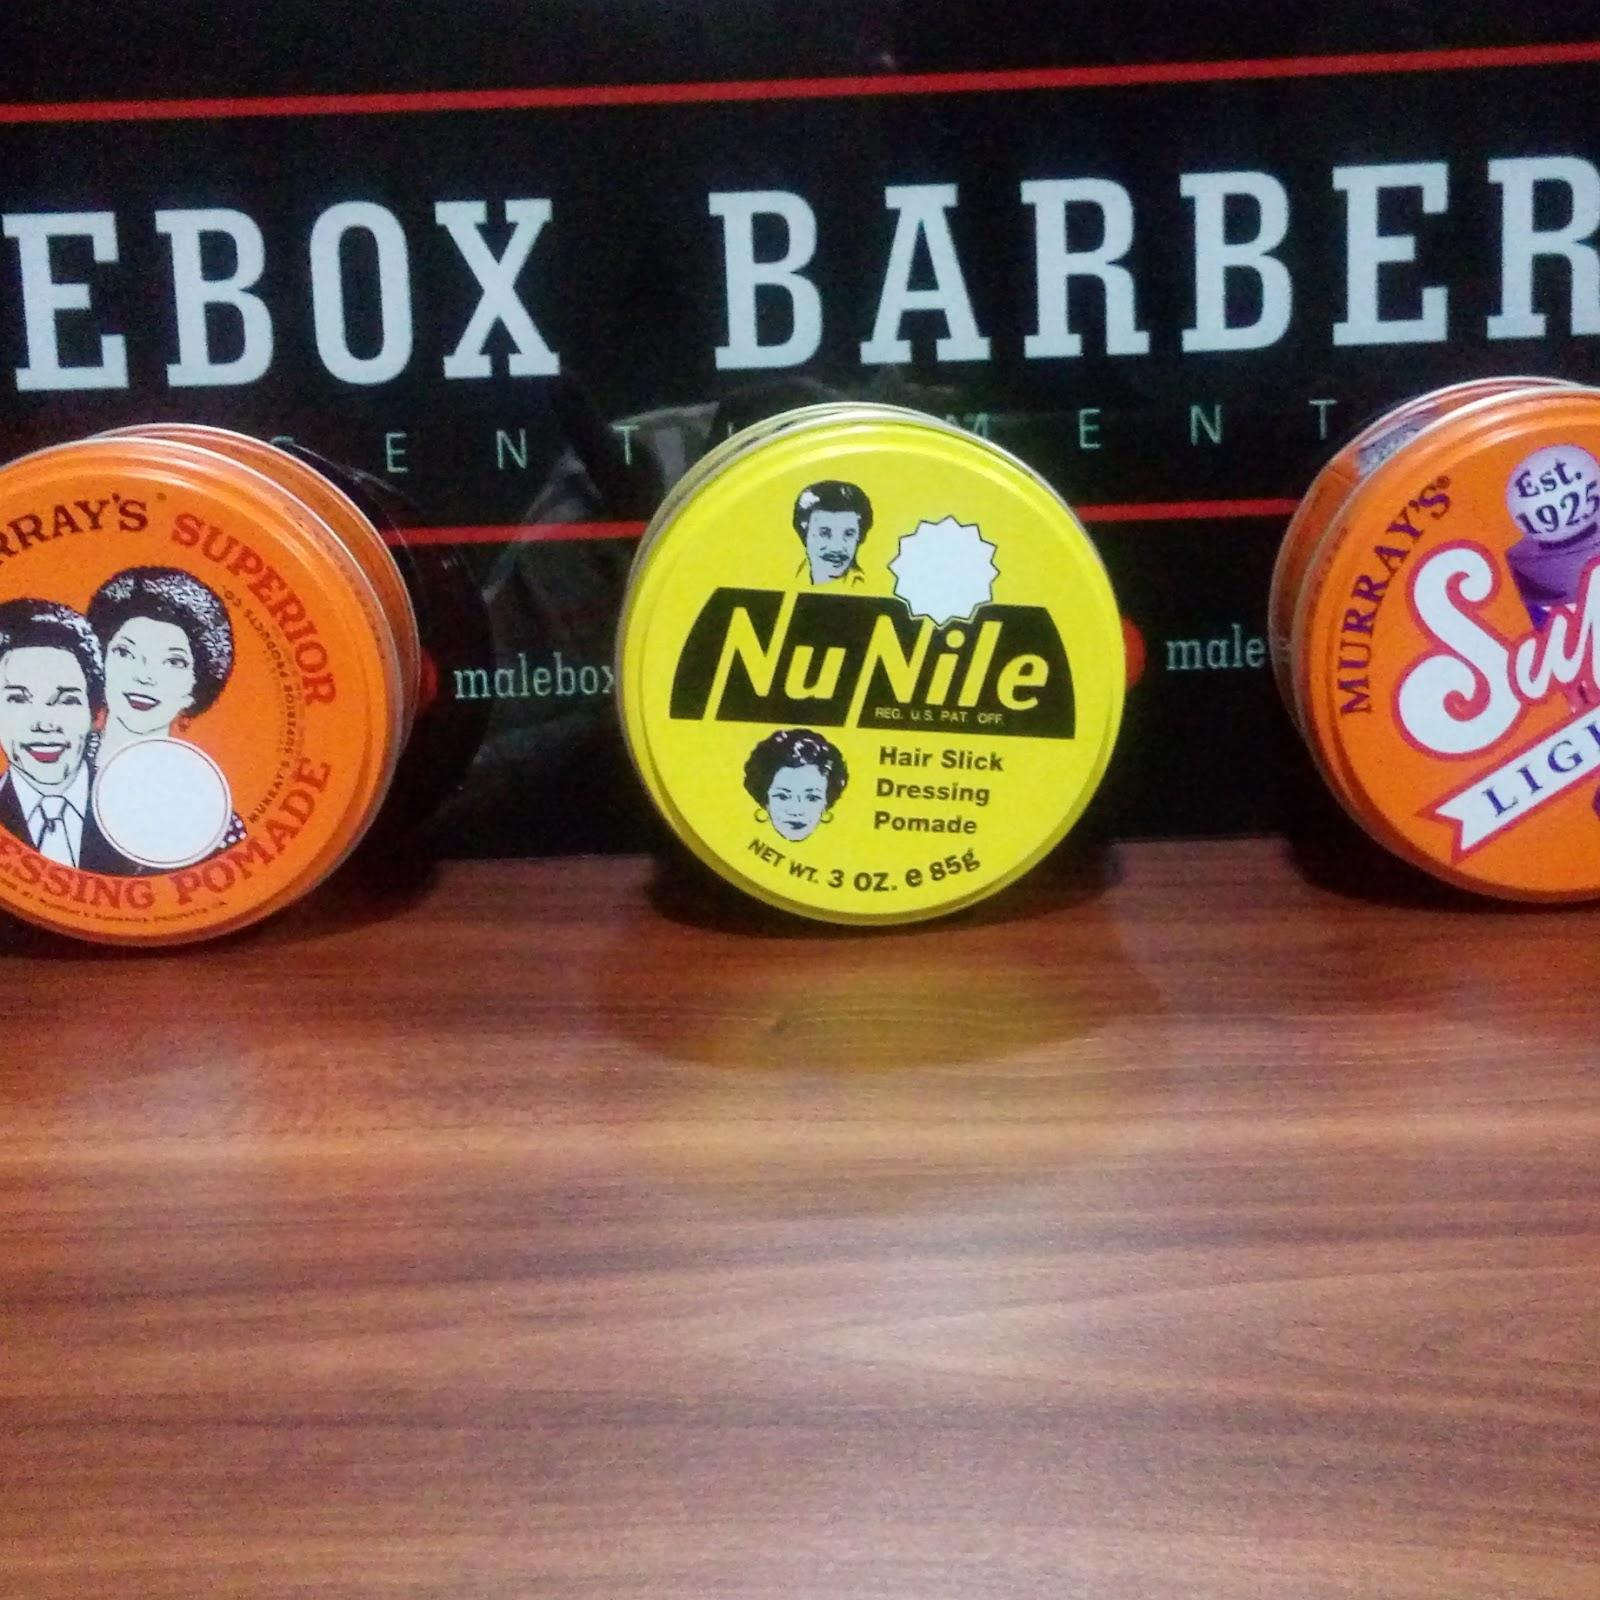 Mungkin kamu sering bertanya-tanya produk rambut mana yang paling baik  untuk styling rambut. Di bawah ini 2dc9e3263f